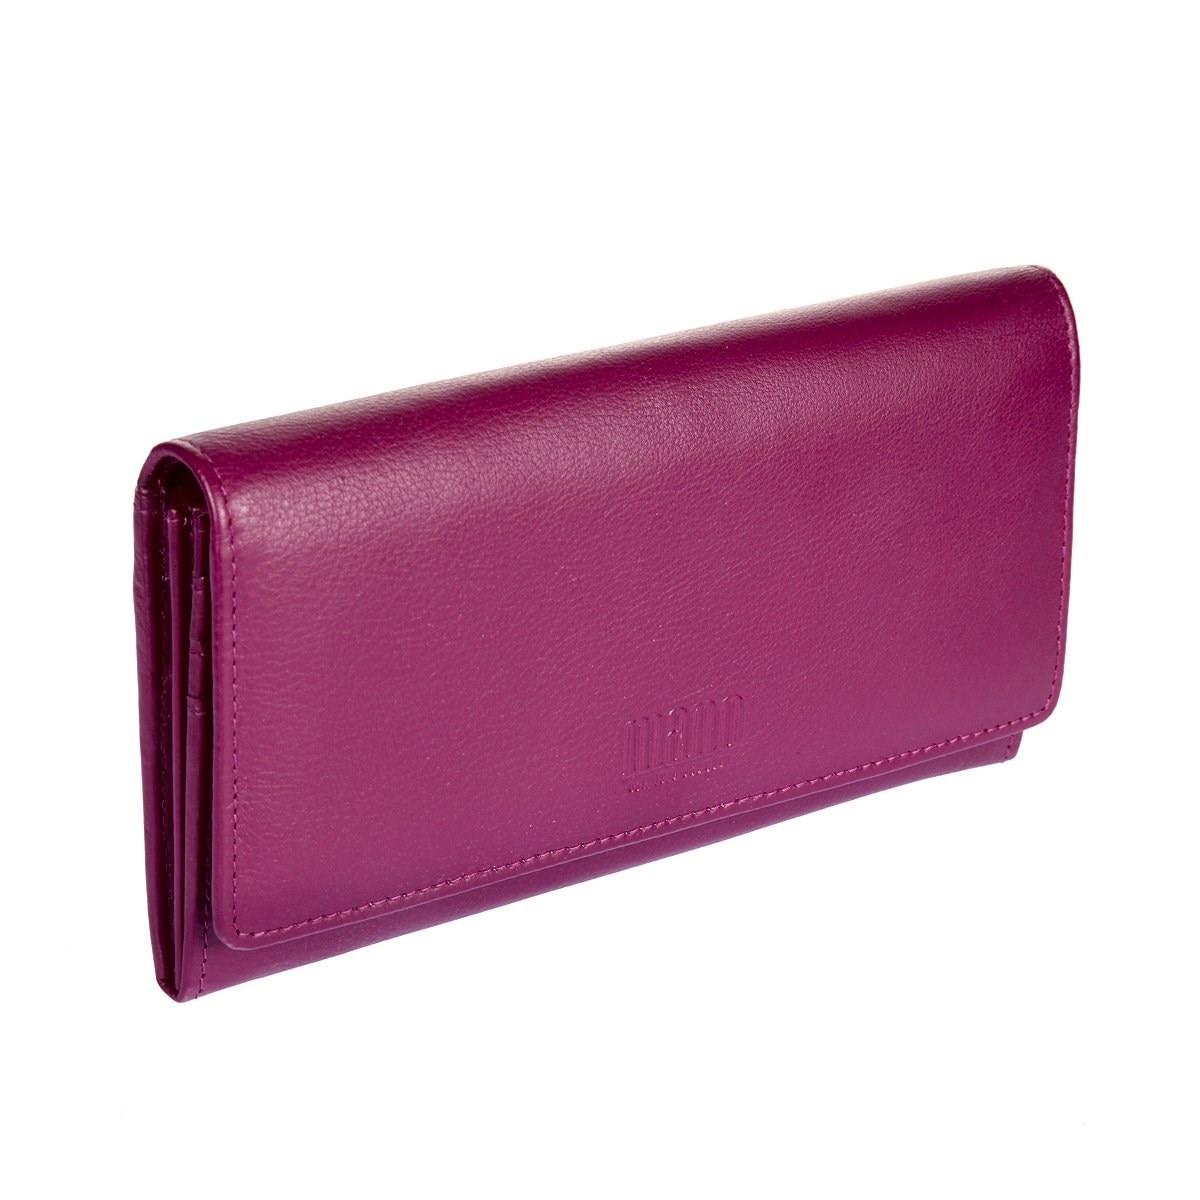 Purse Mano 20100 SETRU fuchsia кошельки бумажники и портмоне mano 20103 setru black